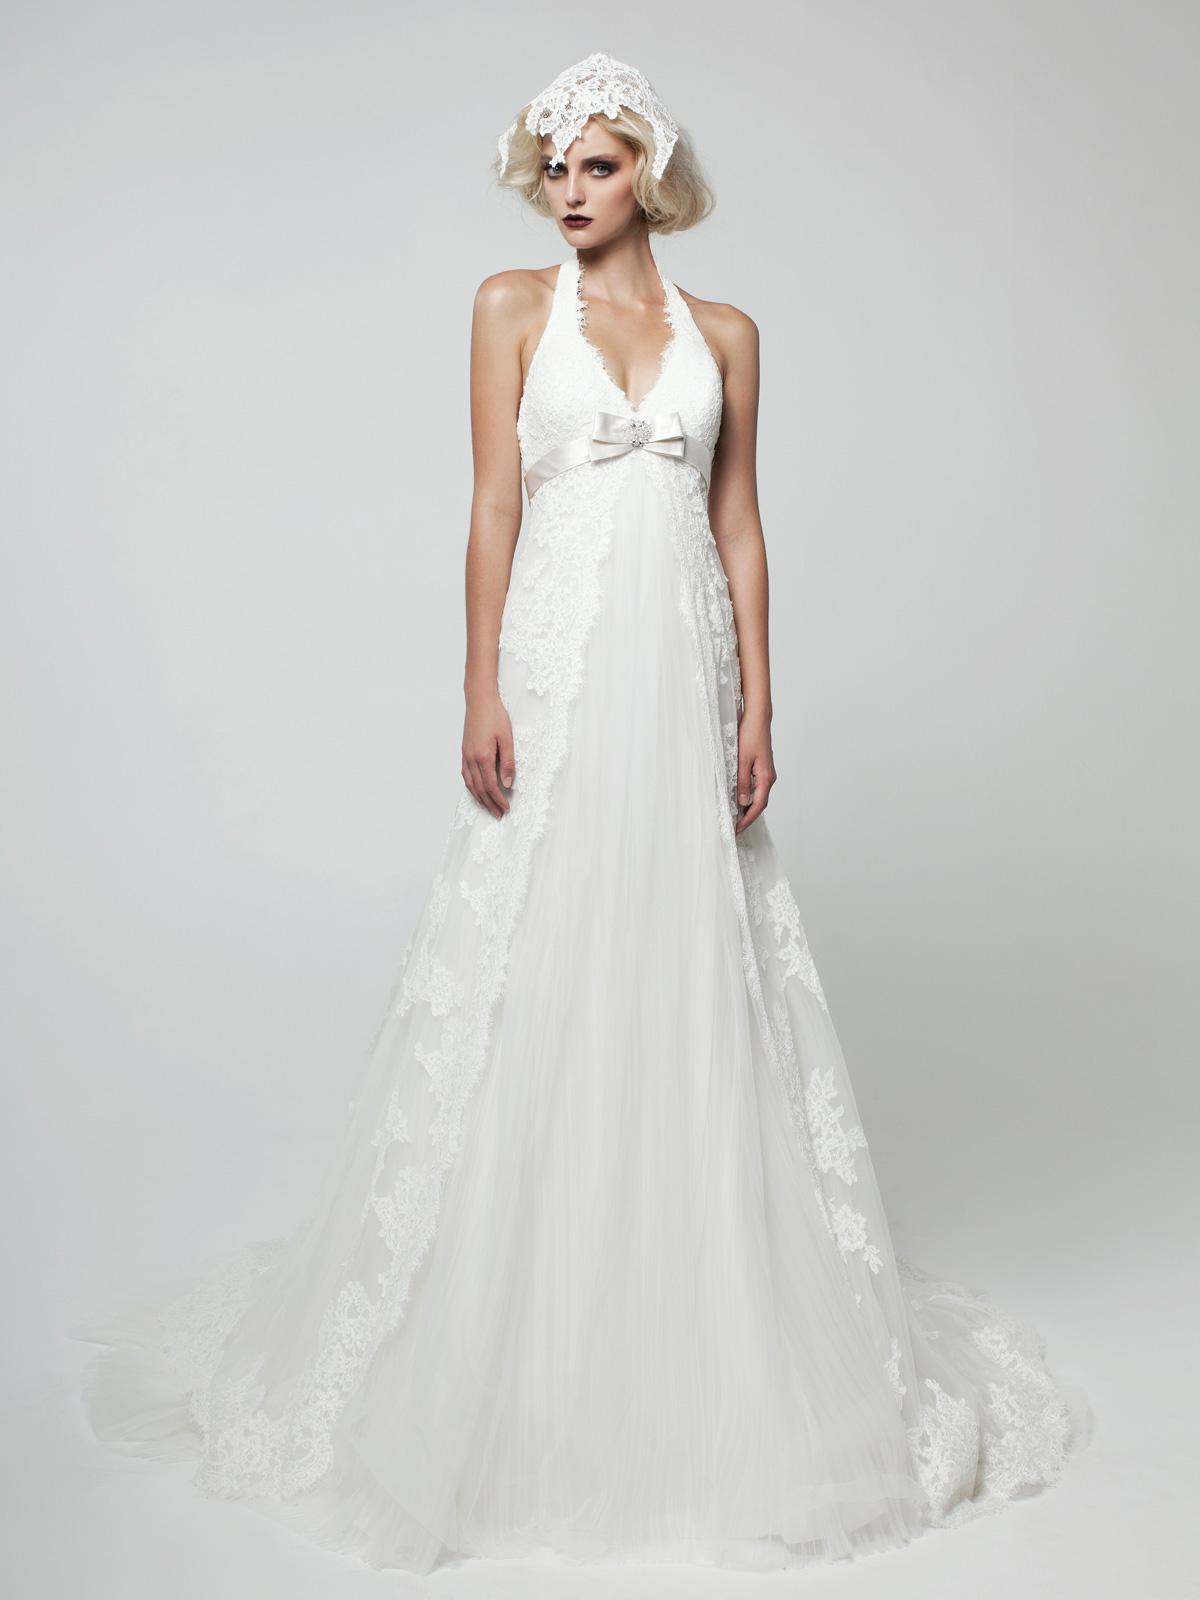 casual wedding dresses casual wedding dresses Casual Wedding Dresses Casual Wedding Dresses